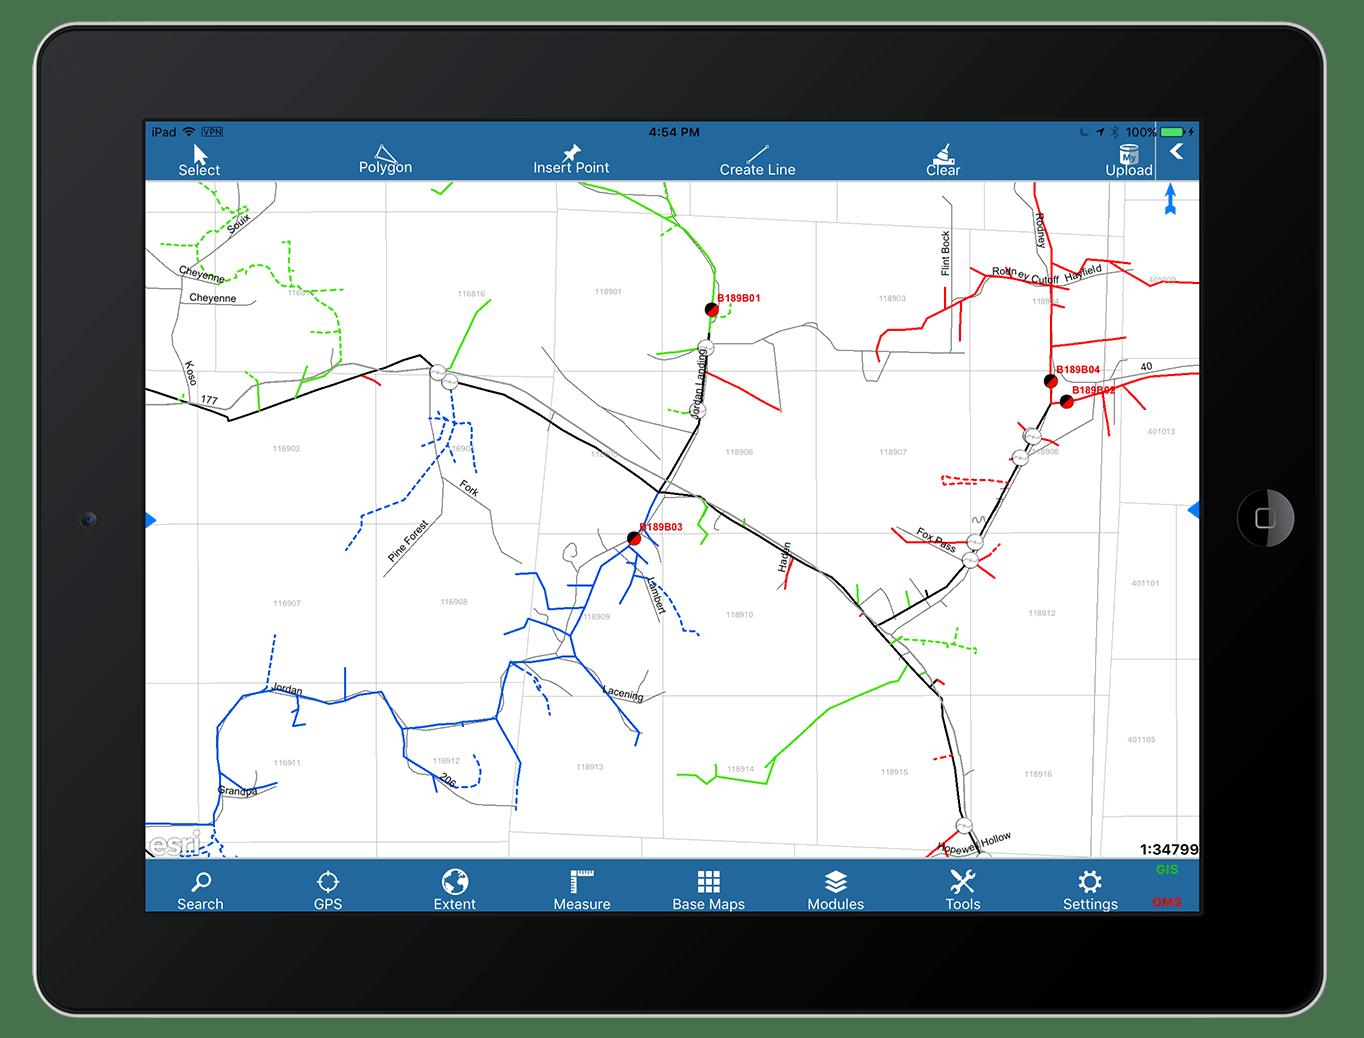 Futura FieldPro Stake GNSS GPS GIS Eos Arrow data collection